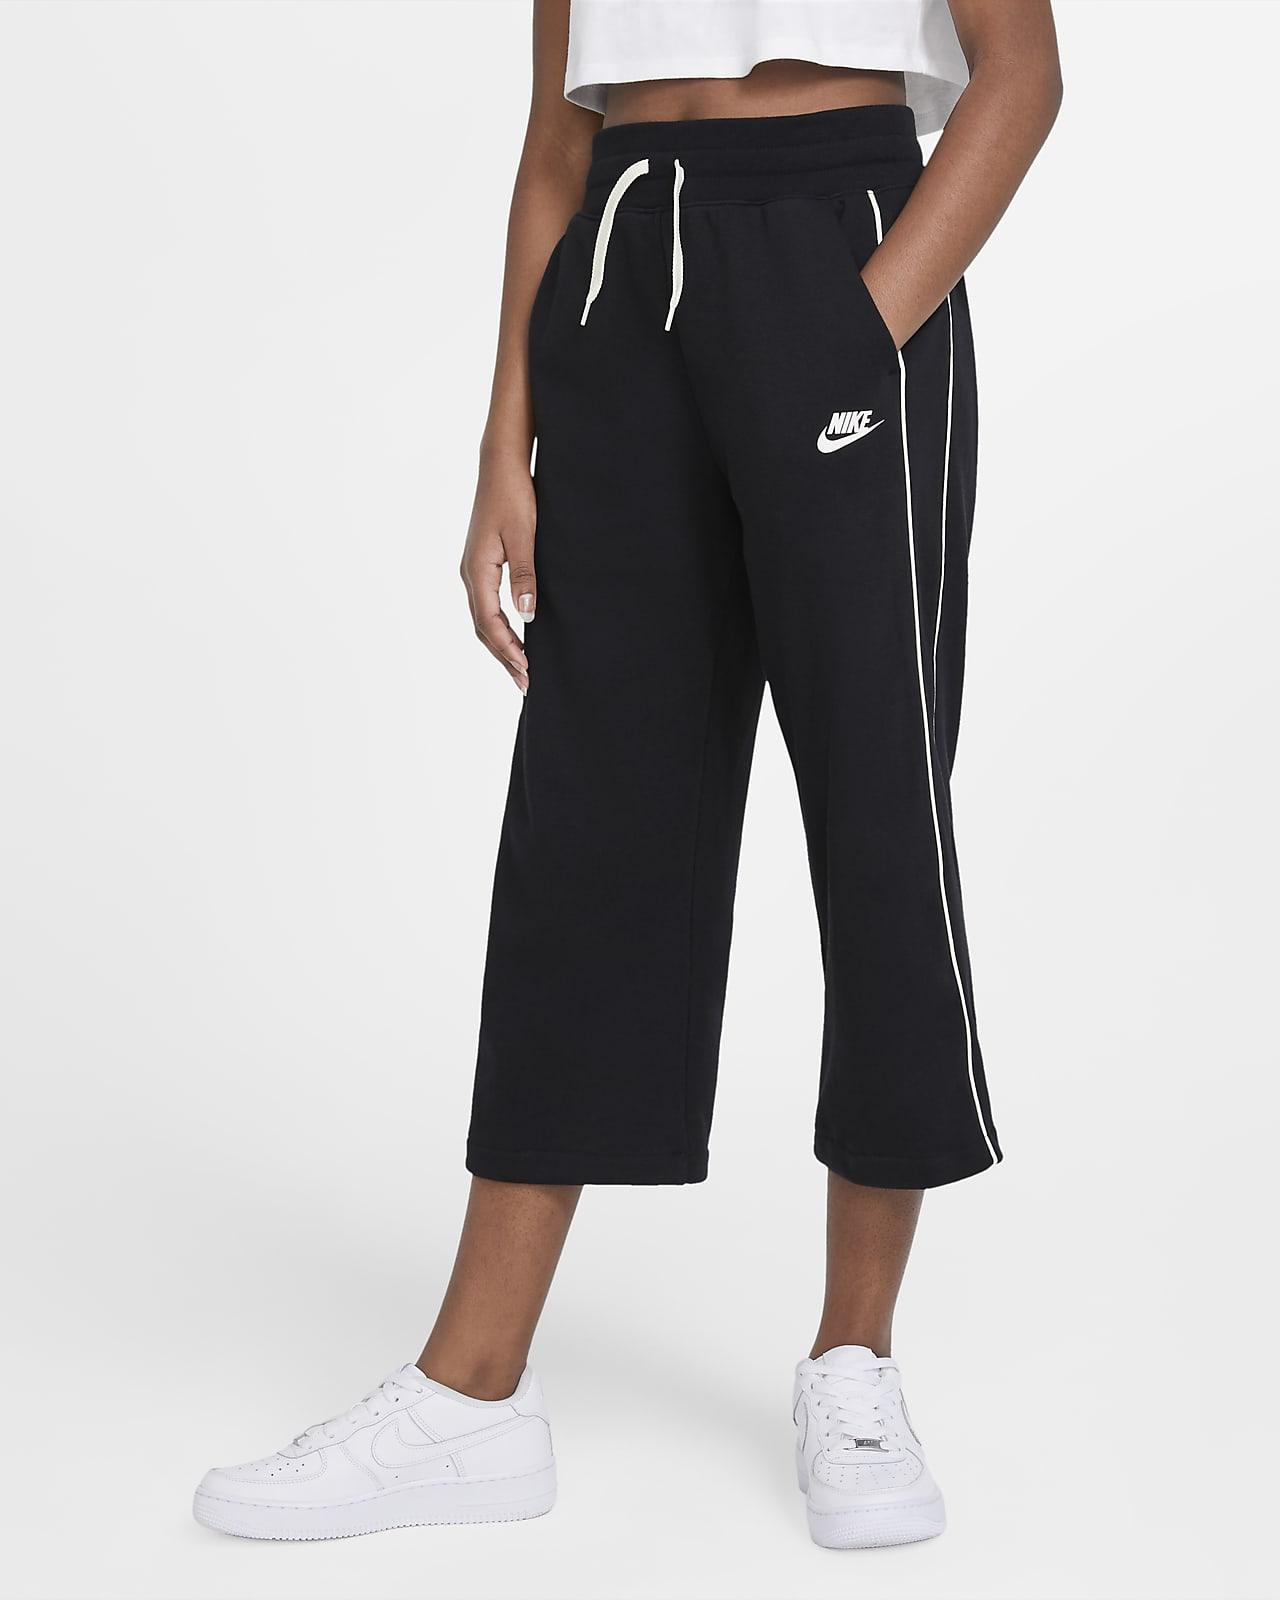 Pantaloni in French Terry Nike Sportswear - Ragazza